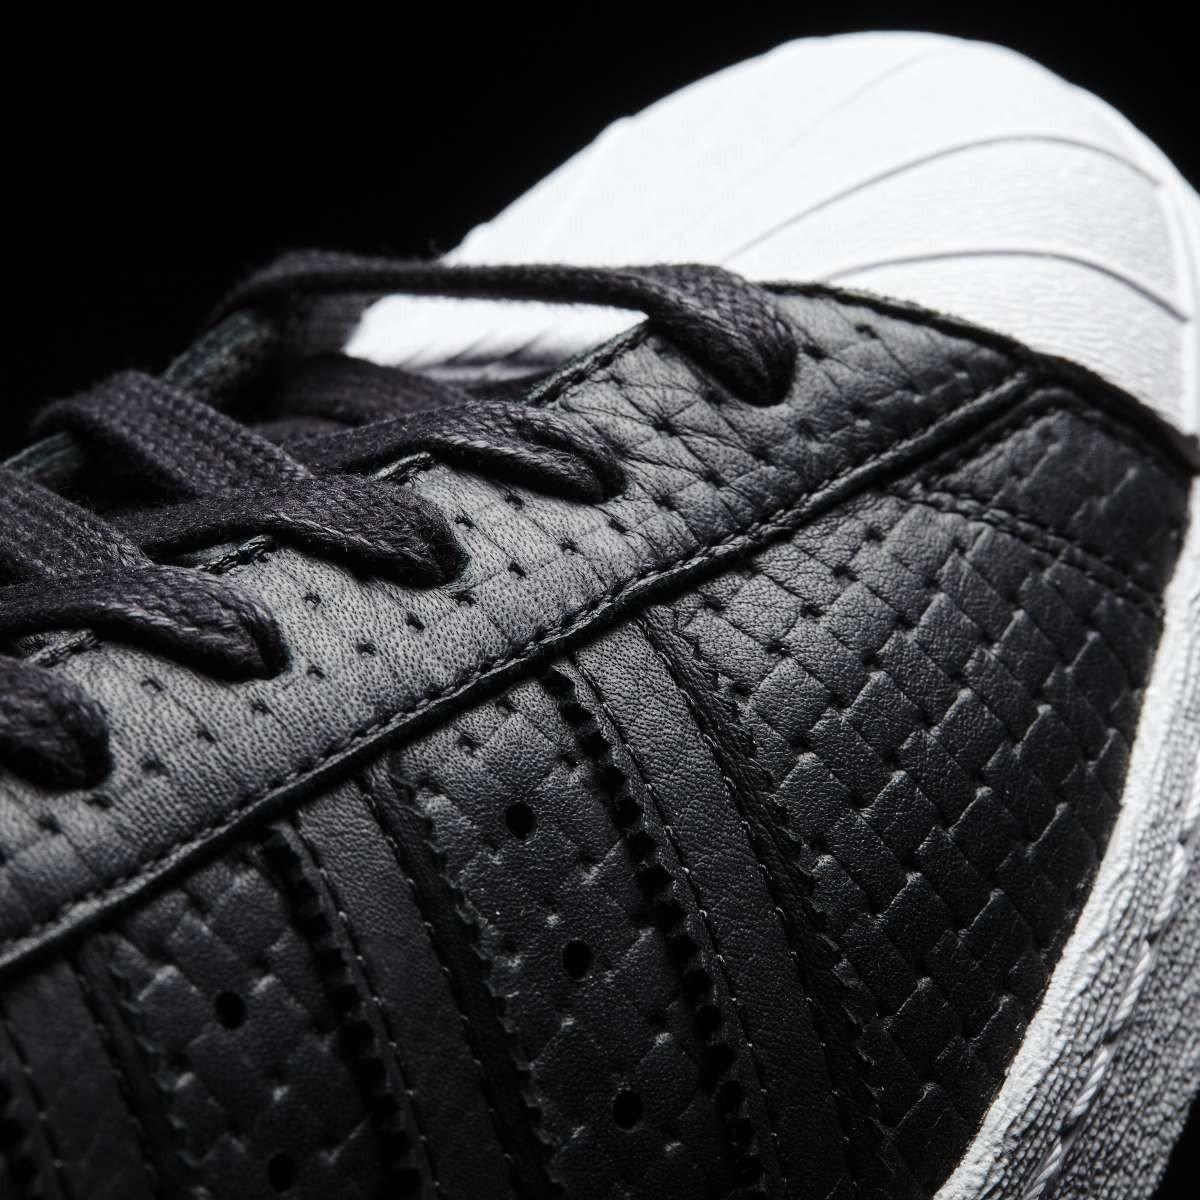 Adidas Superstar Herren 80's Woven Herren Superstar Turnschuhe Schwarz c90e6b